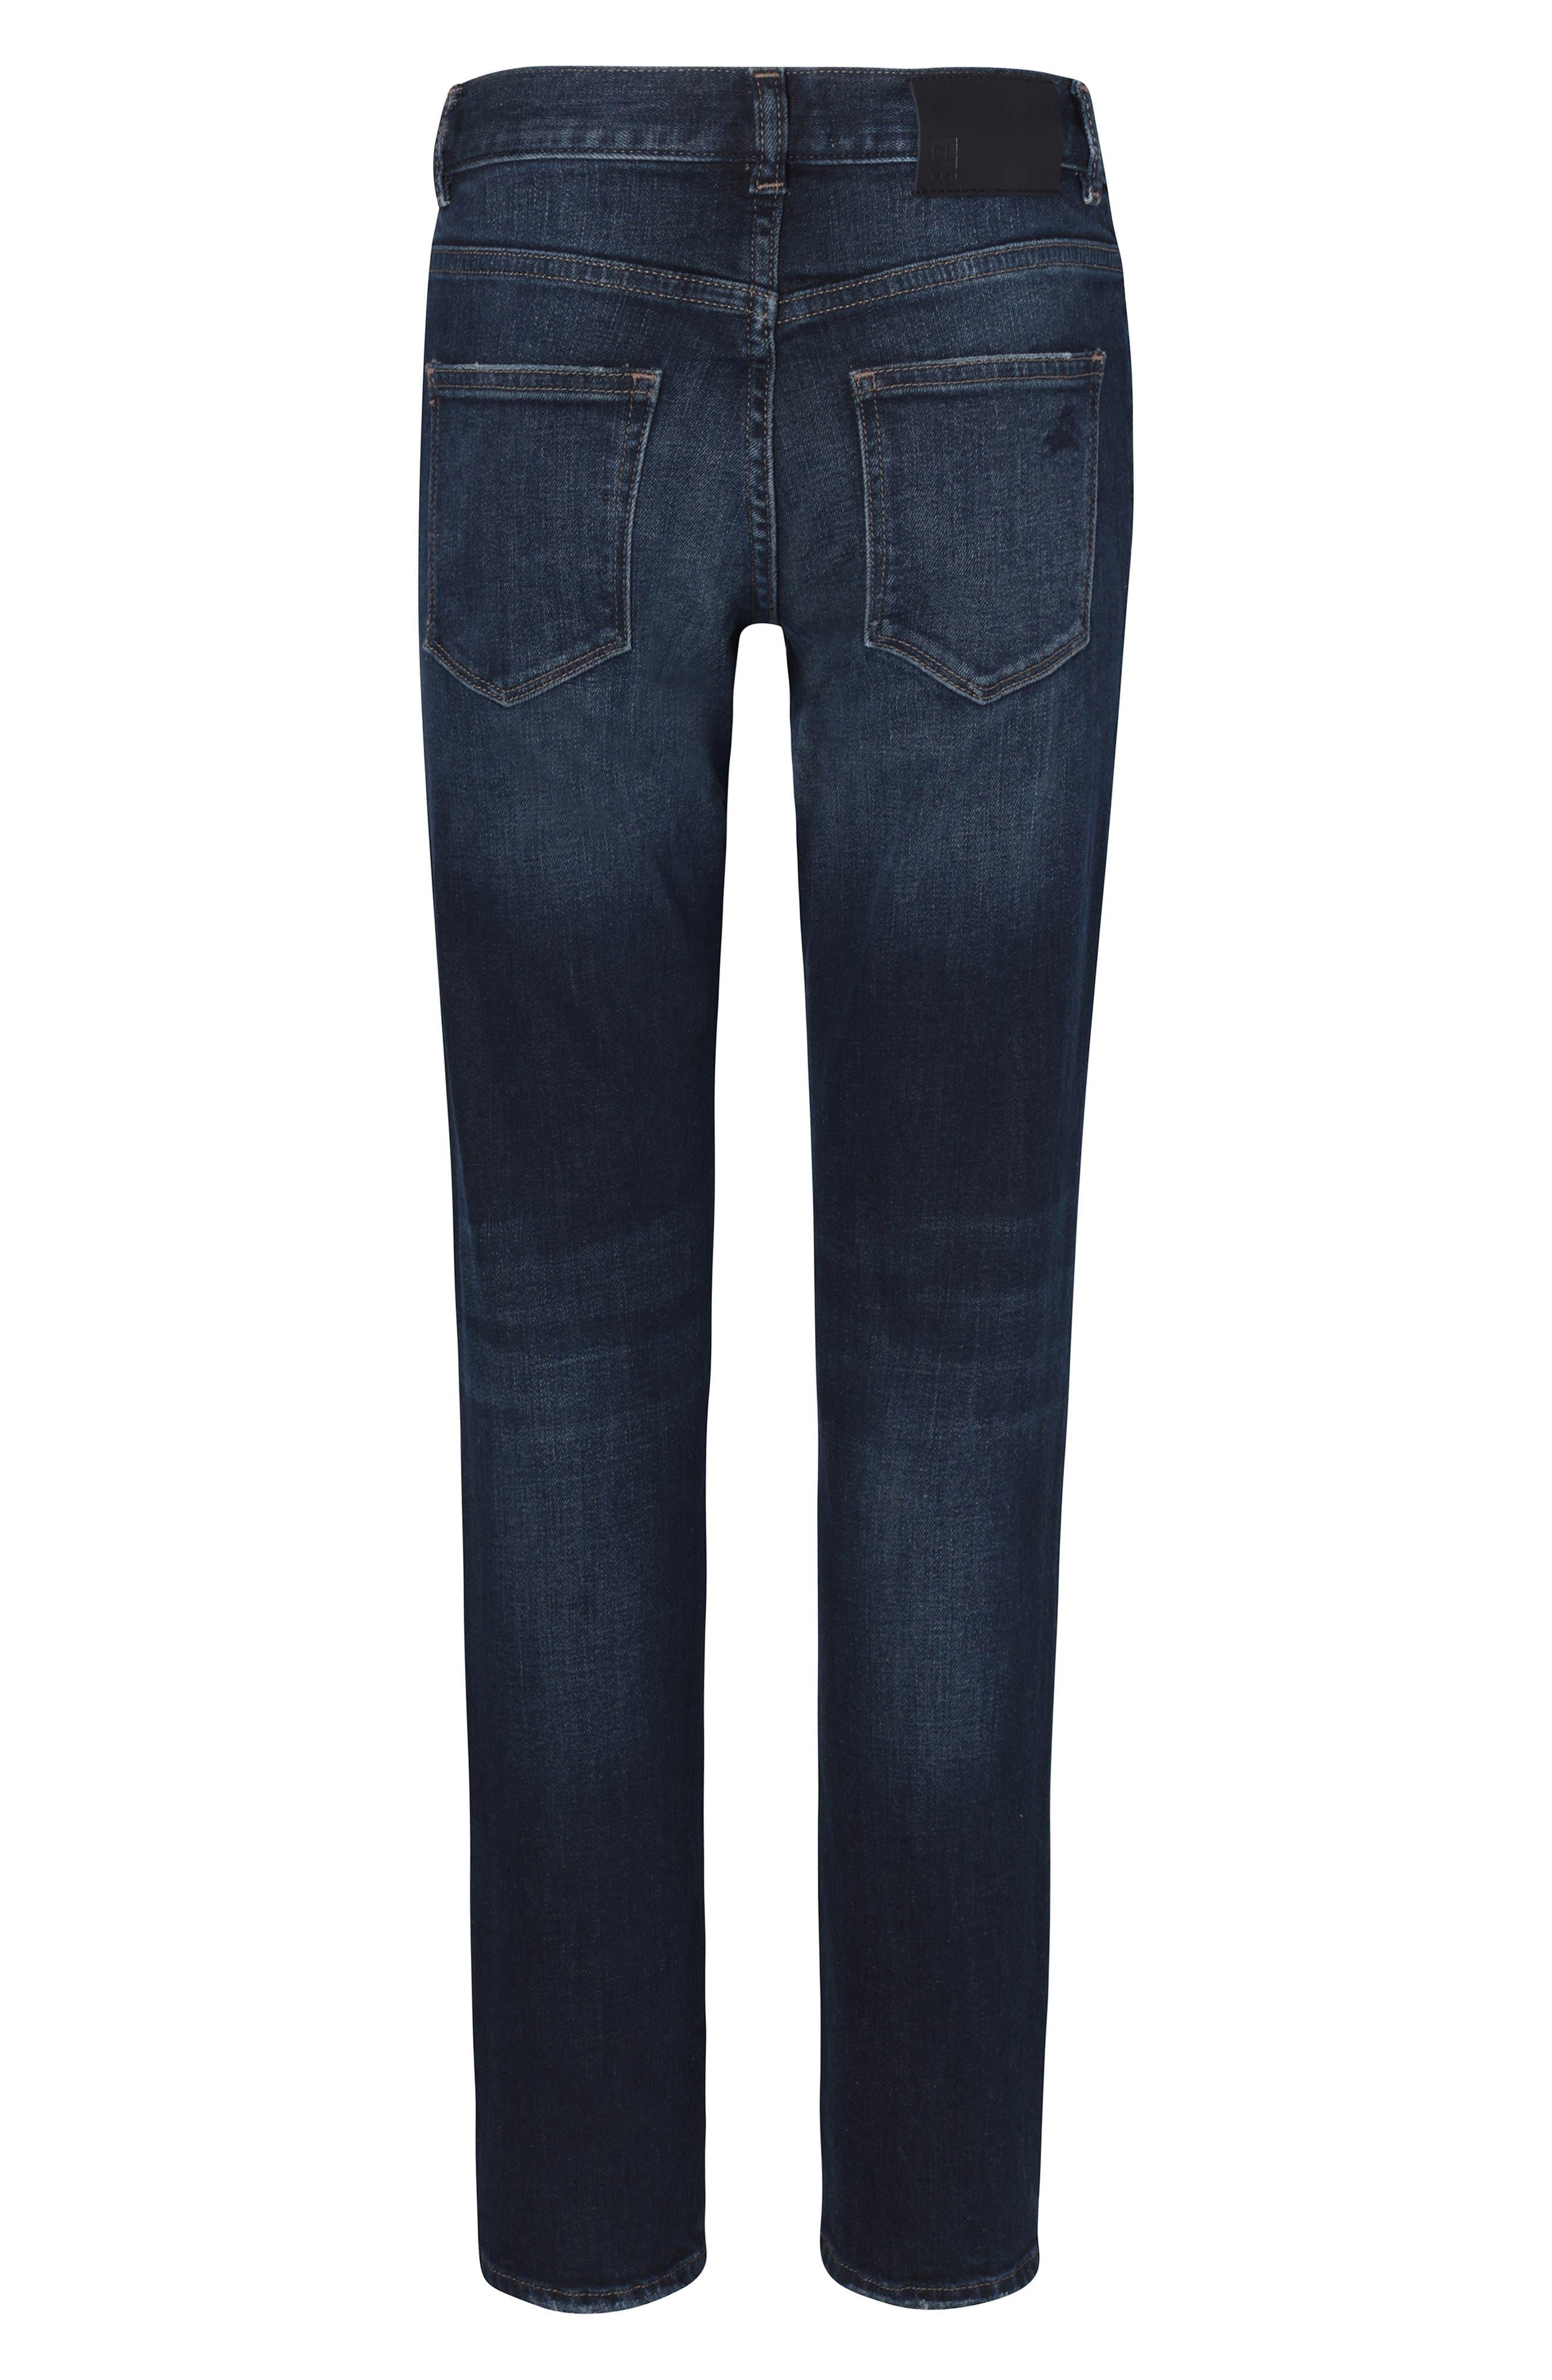 Brady Distressed Slim Fit Jeans,                             Alternate thumbnail 2, color,                             BLUE